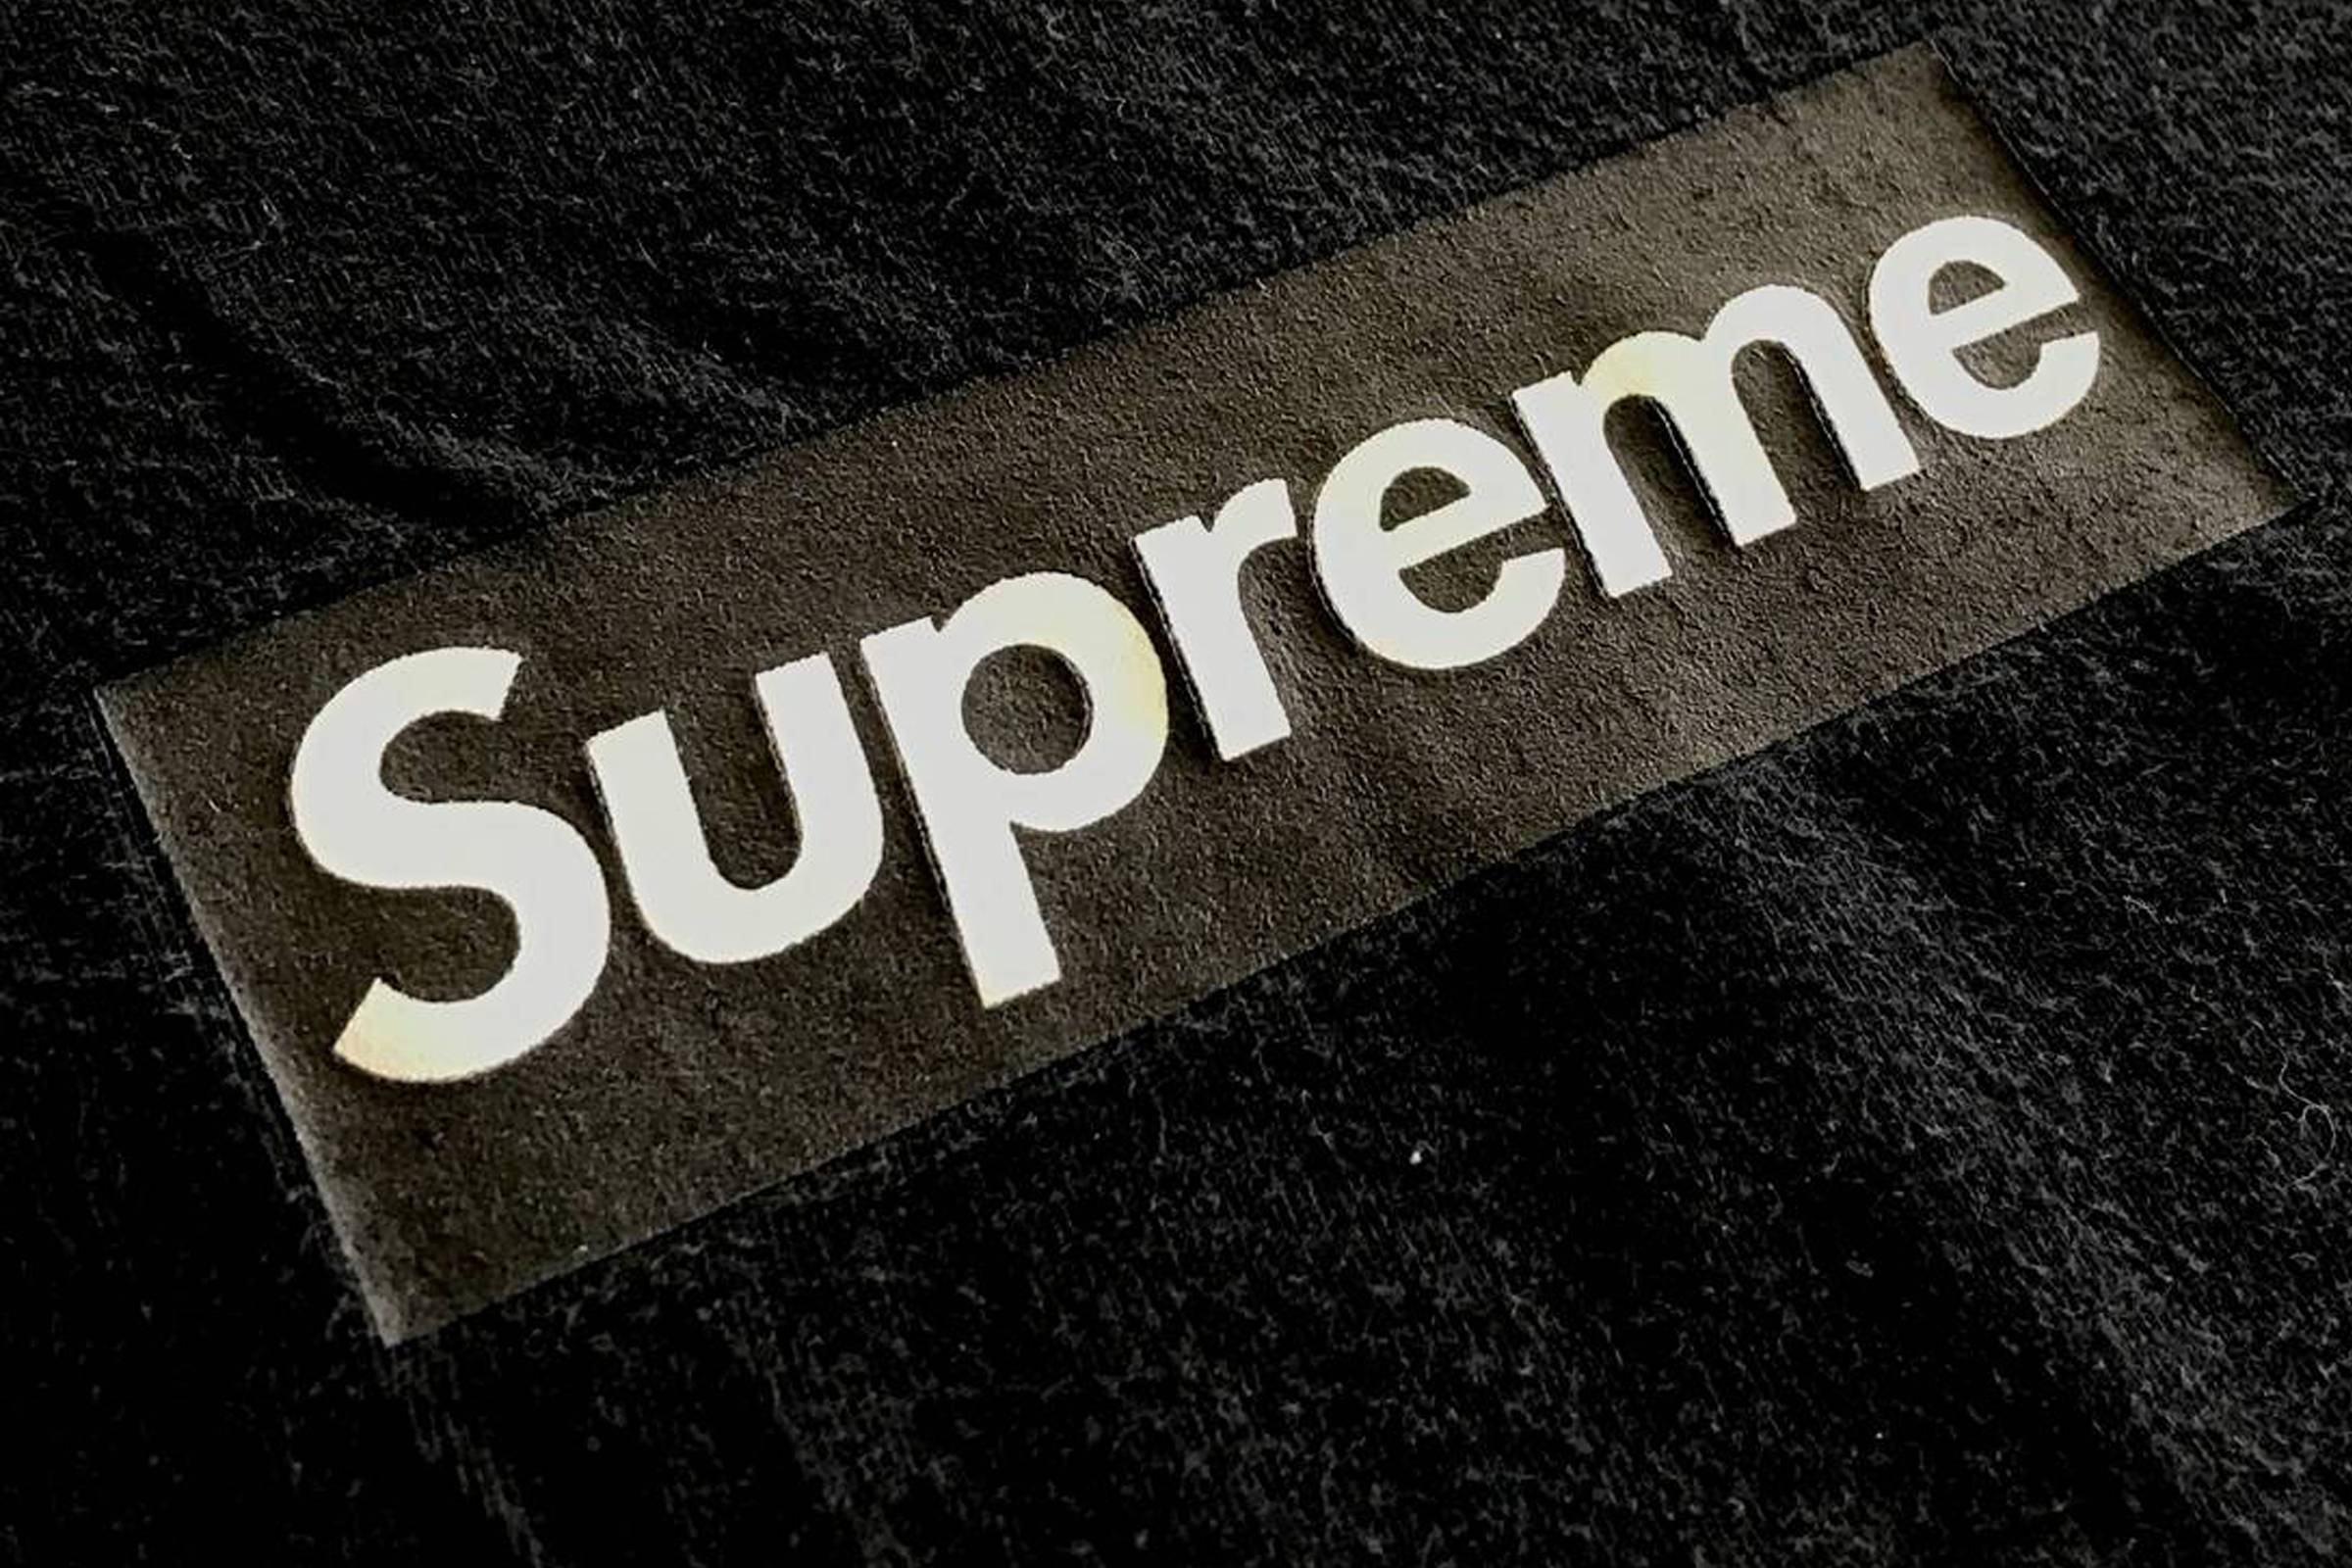 Supreme x Neighborhood Black Box Logo, from the wardrobe of Nick Rubin